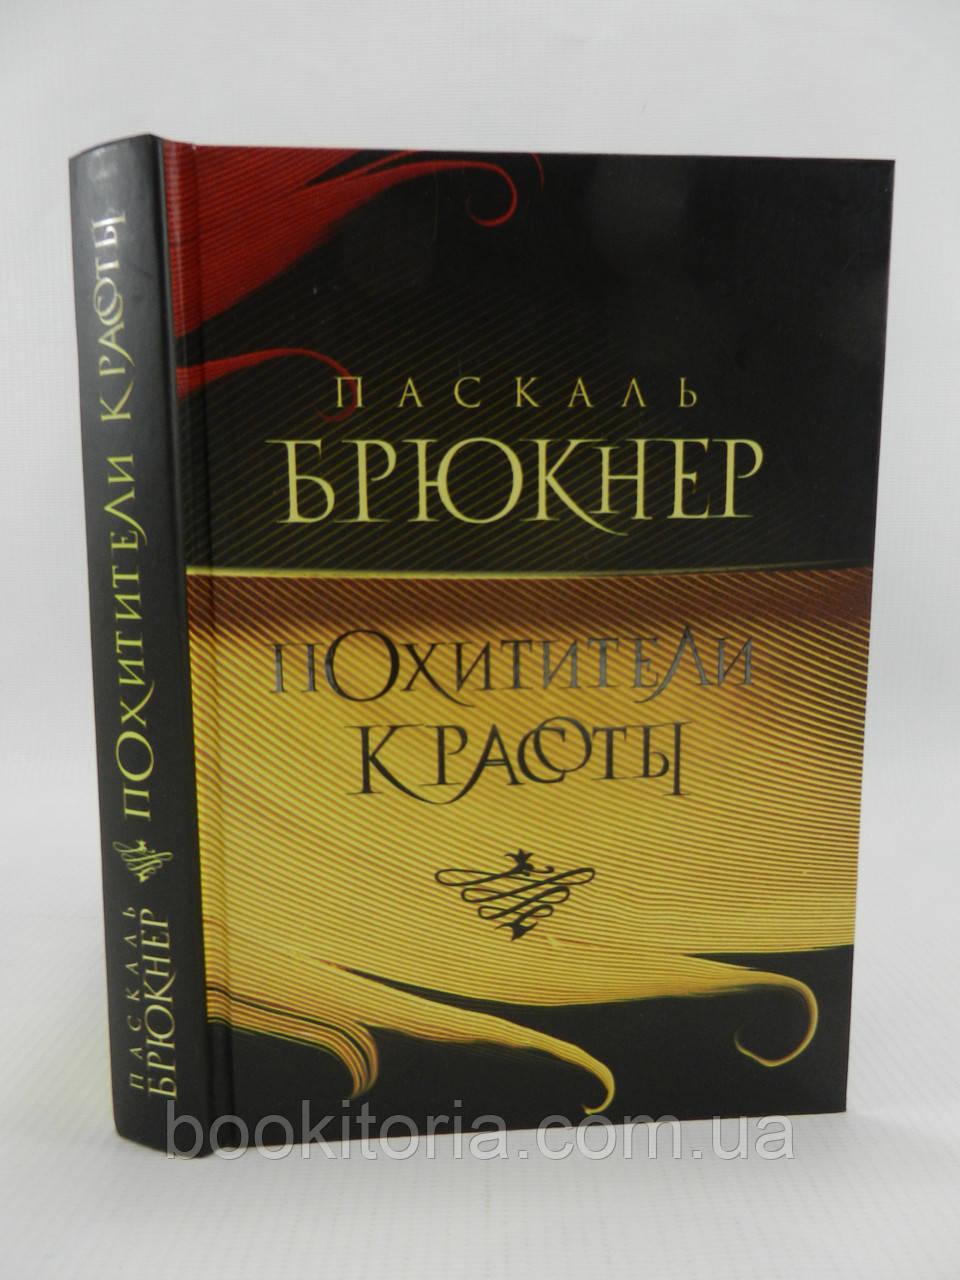 Брюкнер П. Похитители красоты (б/у).